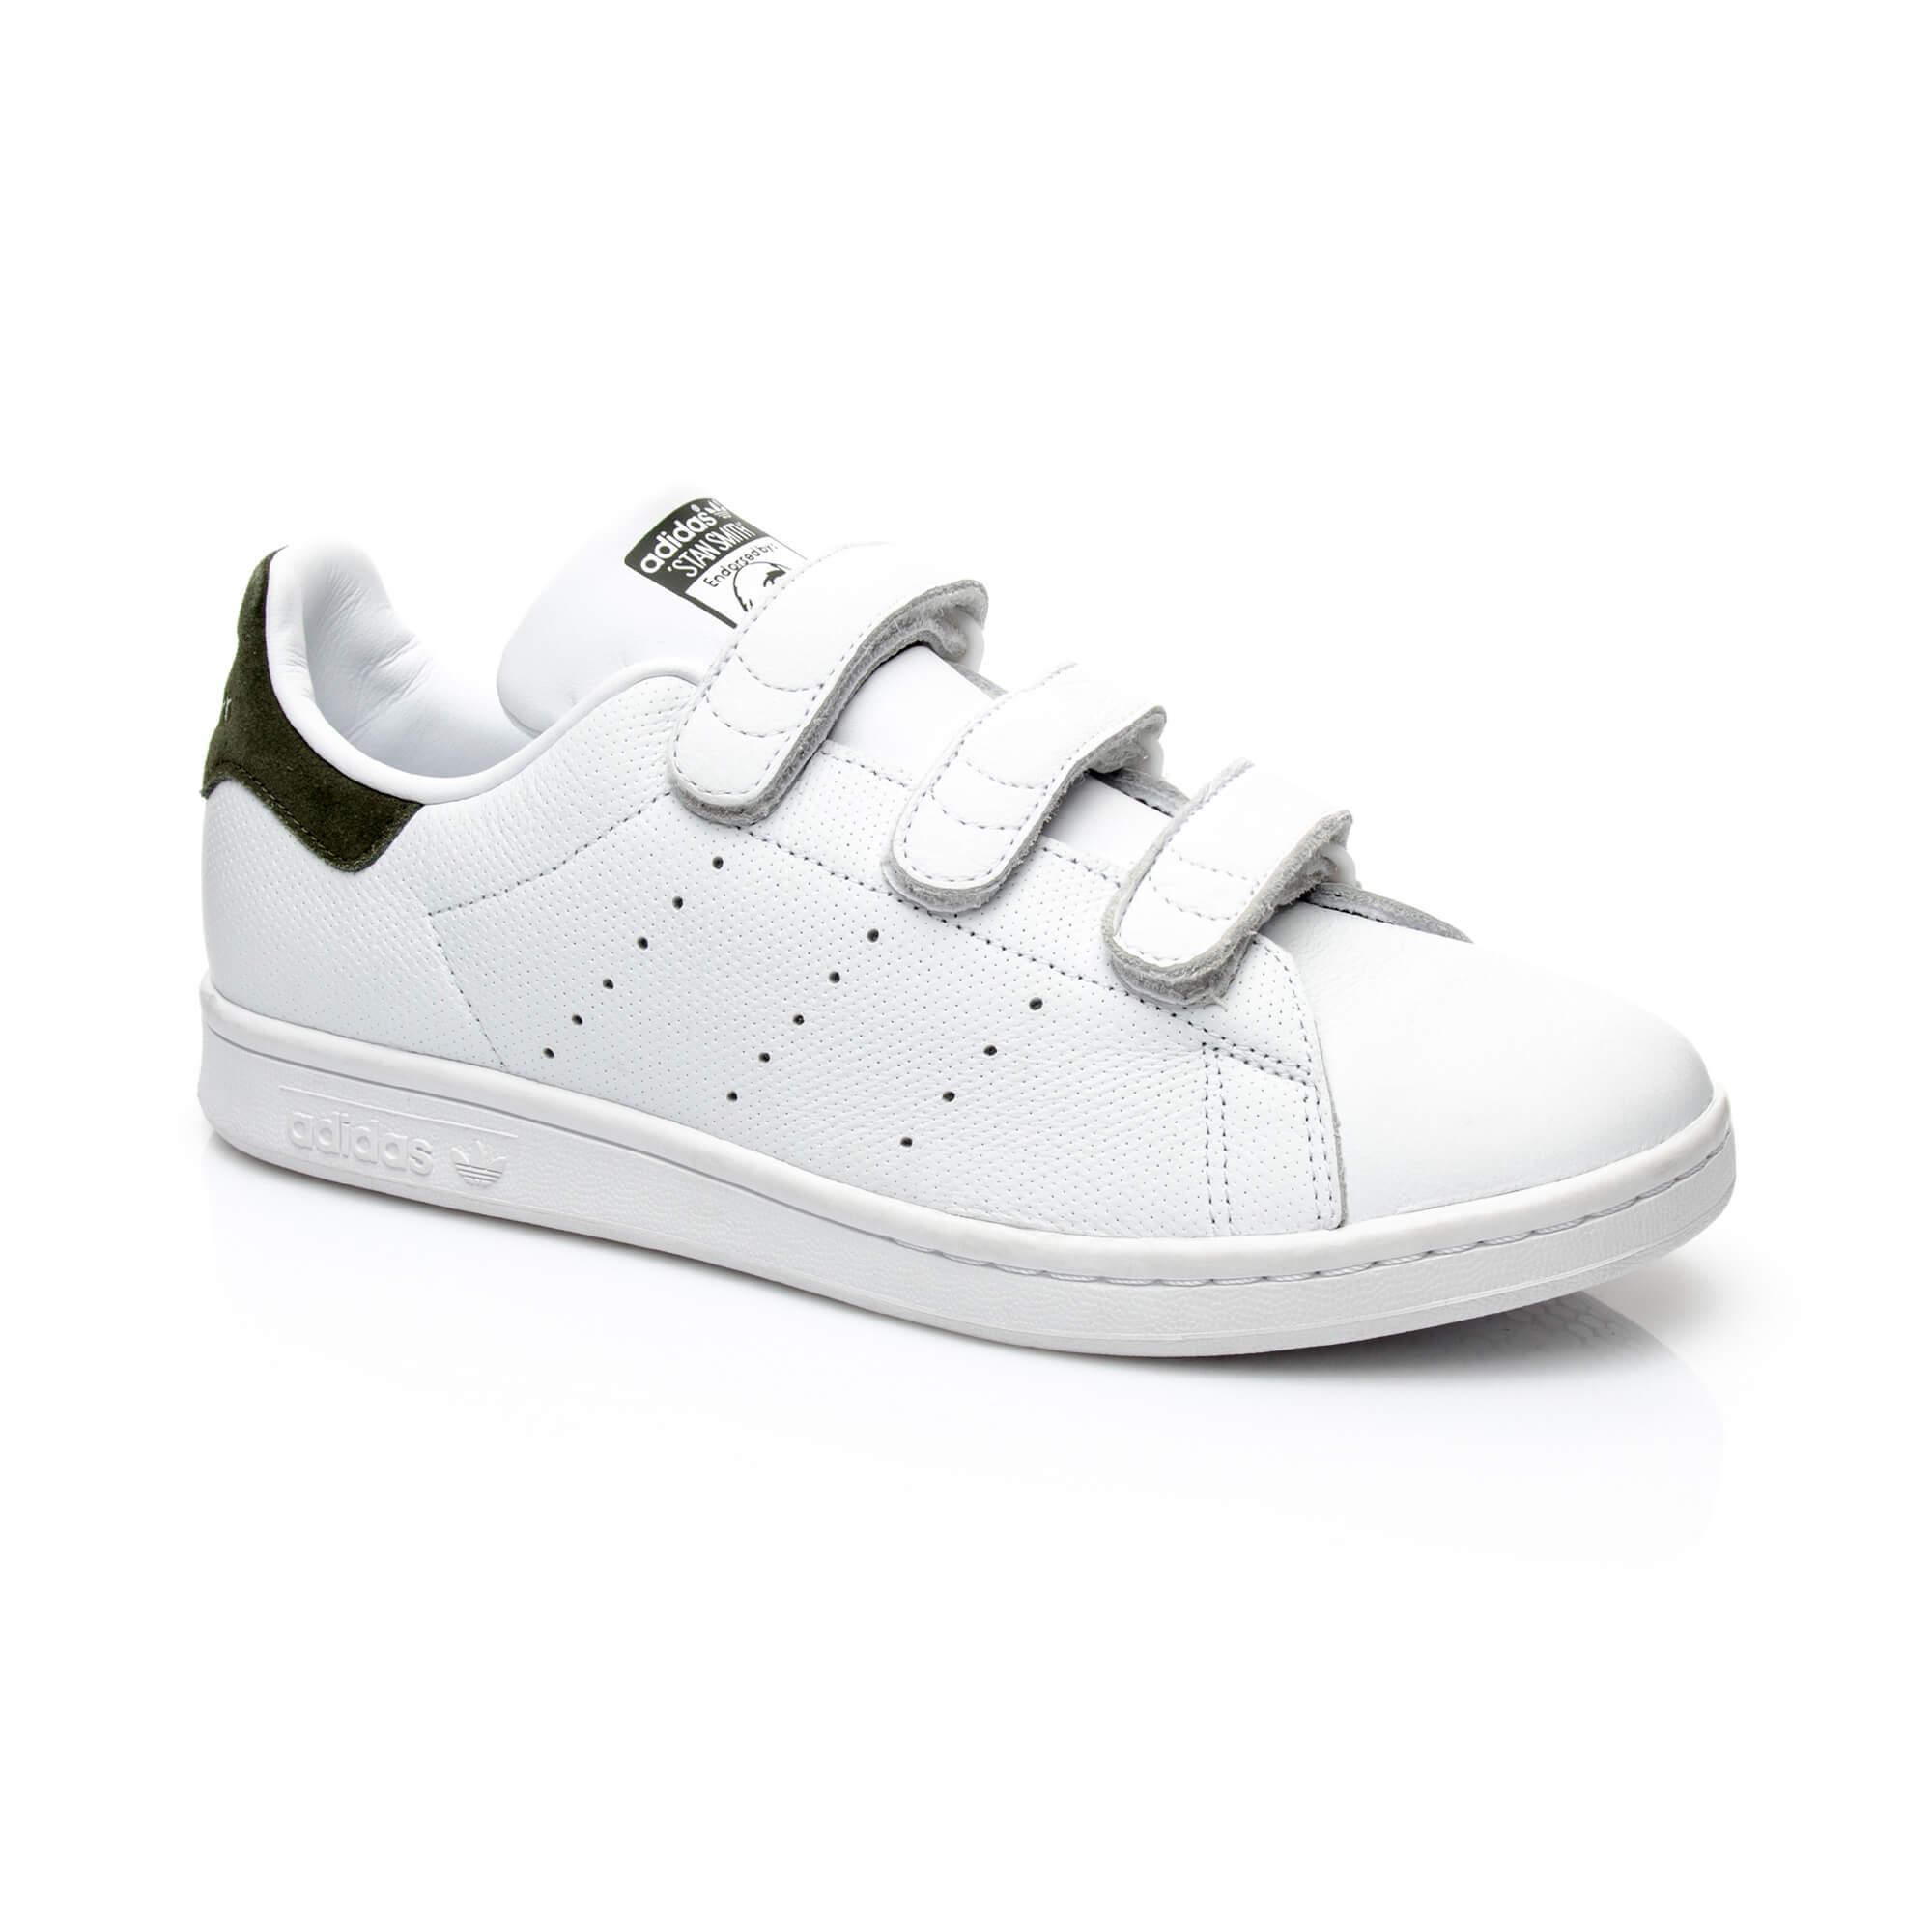 incidente conductor Deseo  adidas Stan Smith Unisex Beyaz Sneaker Kadin Spor Ayakkabı & Sneaker  3146140 | SuperStep